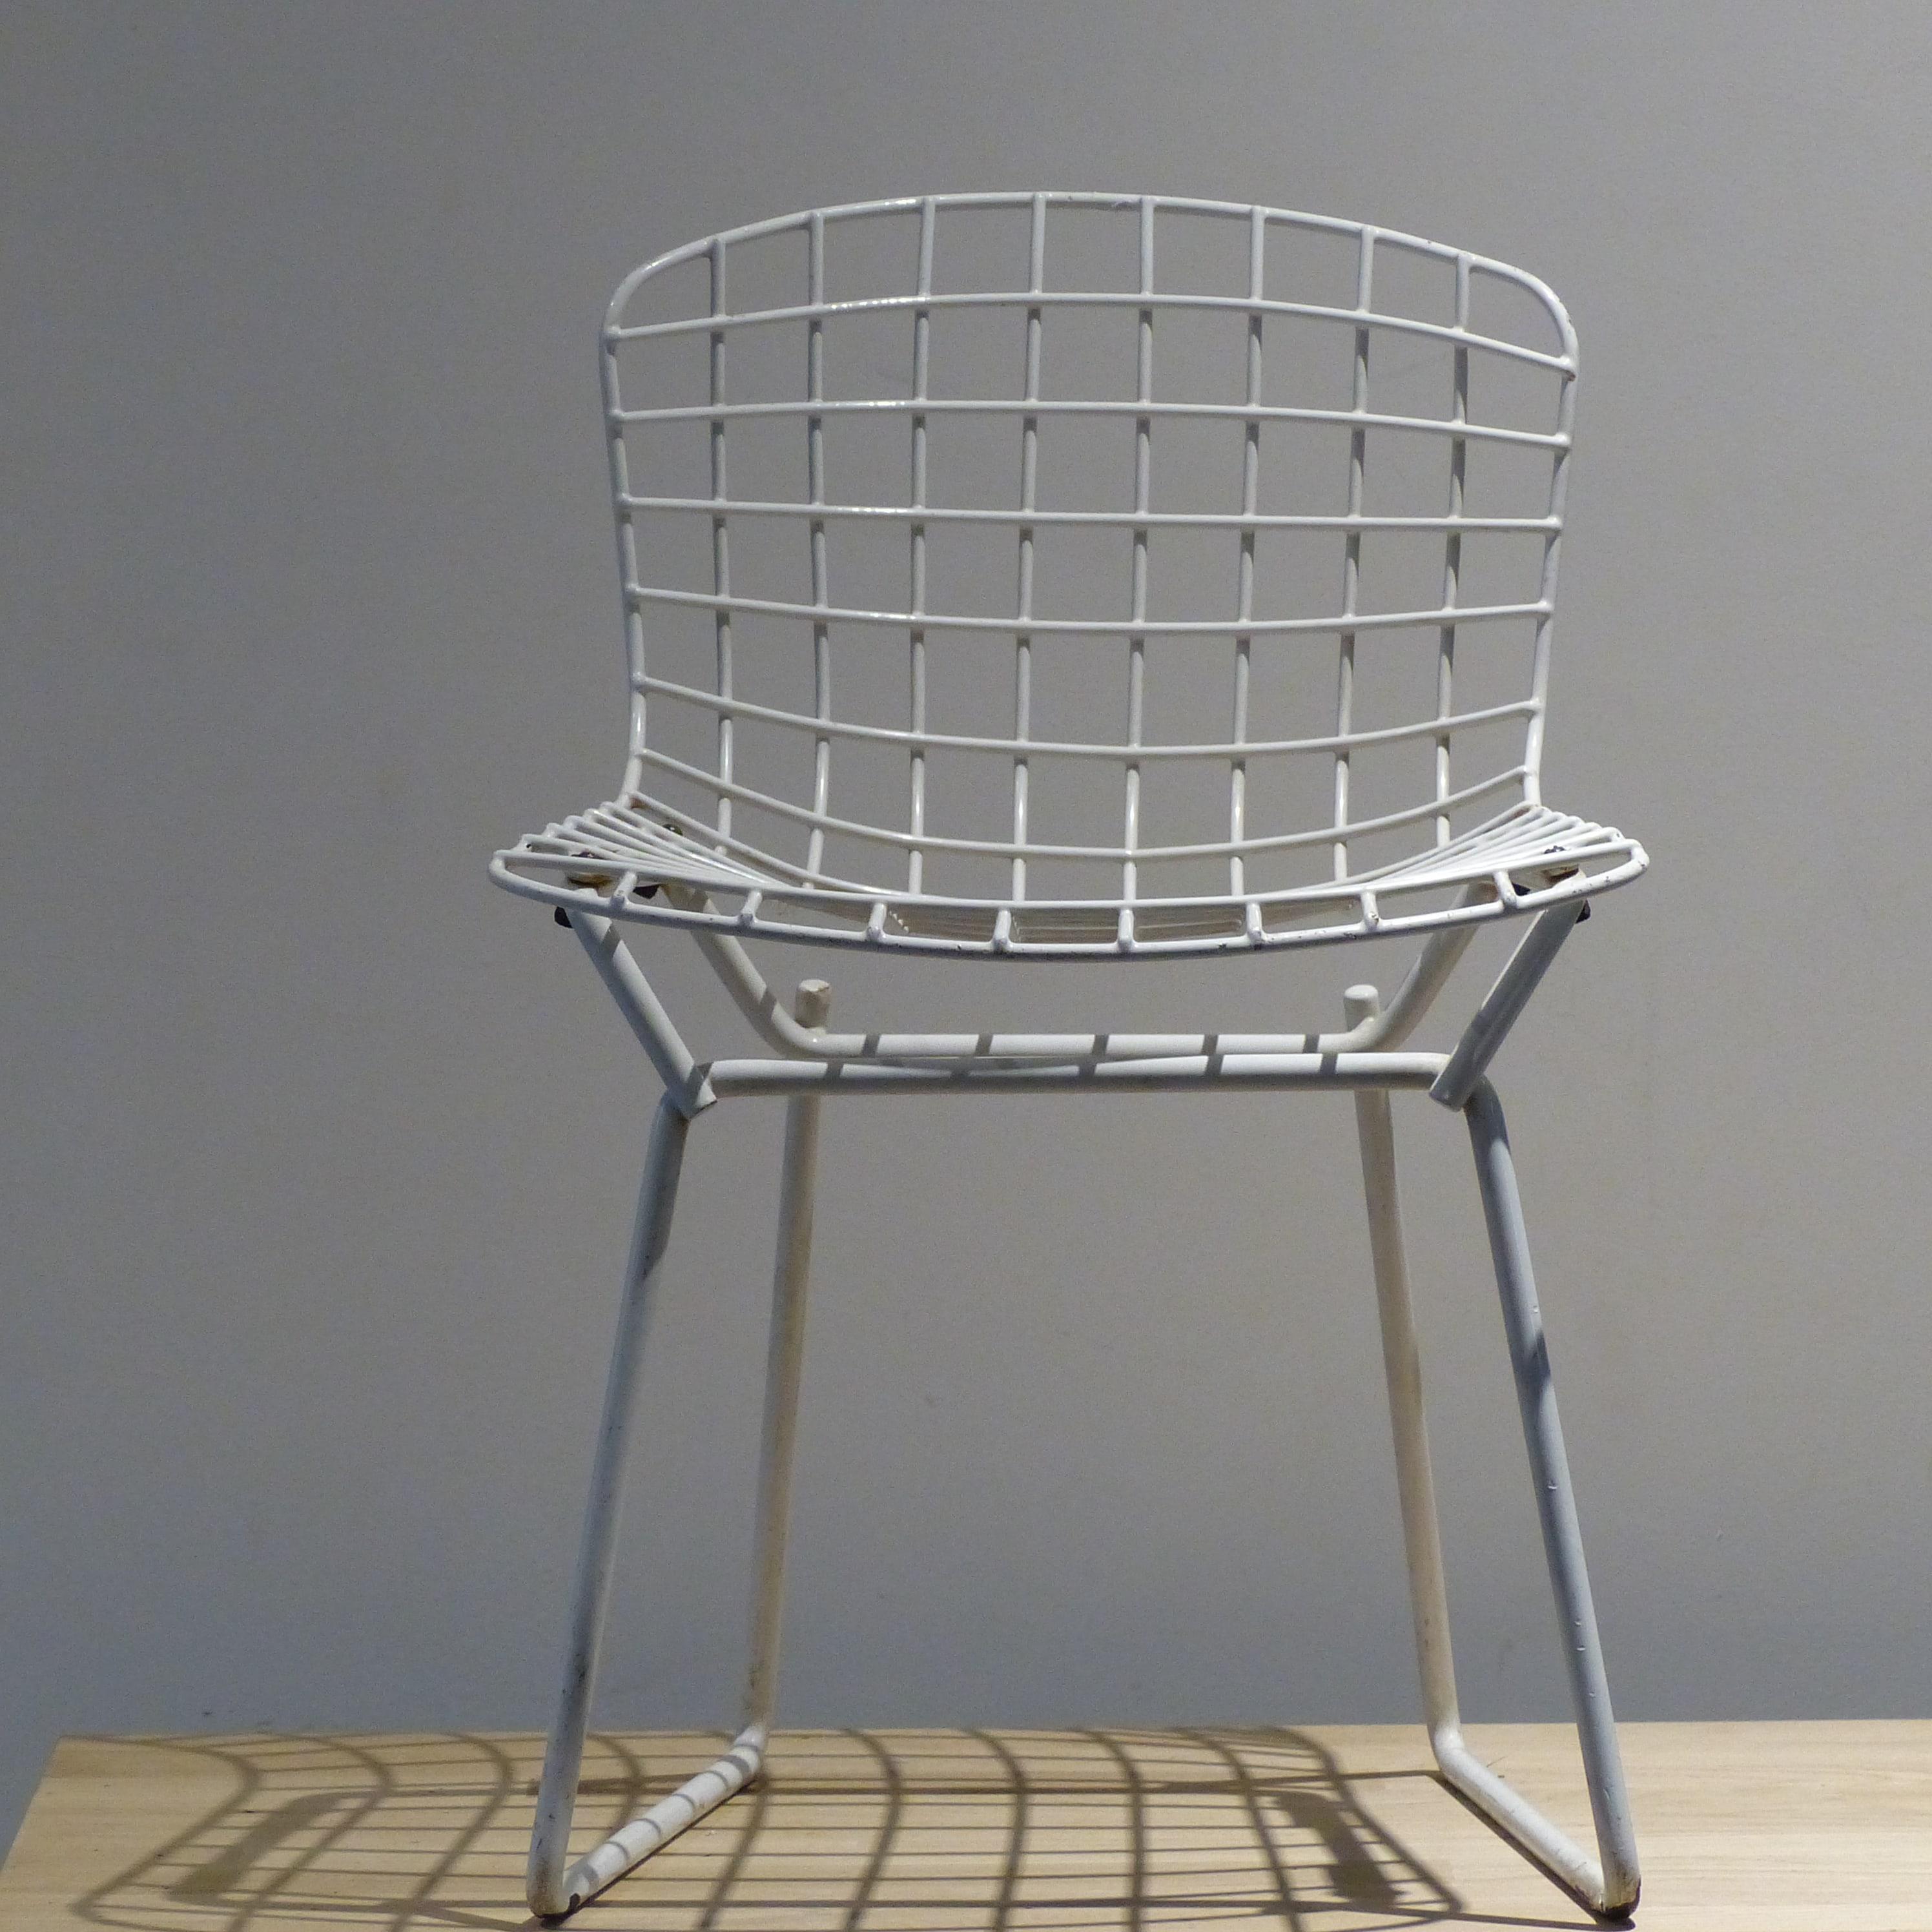 Galette chaise bertoia chaise bertoia belle chaise new chaise bertoia prix hi res wallpaper - Galette pour chaise bertoia ...